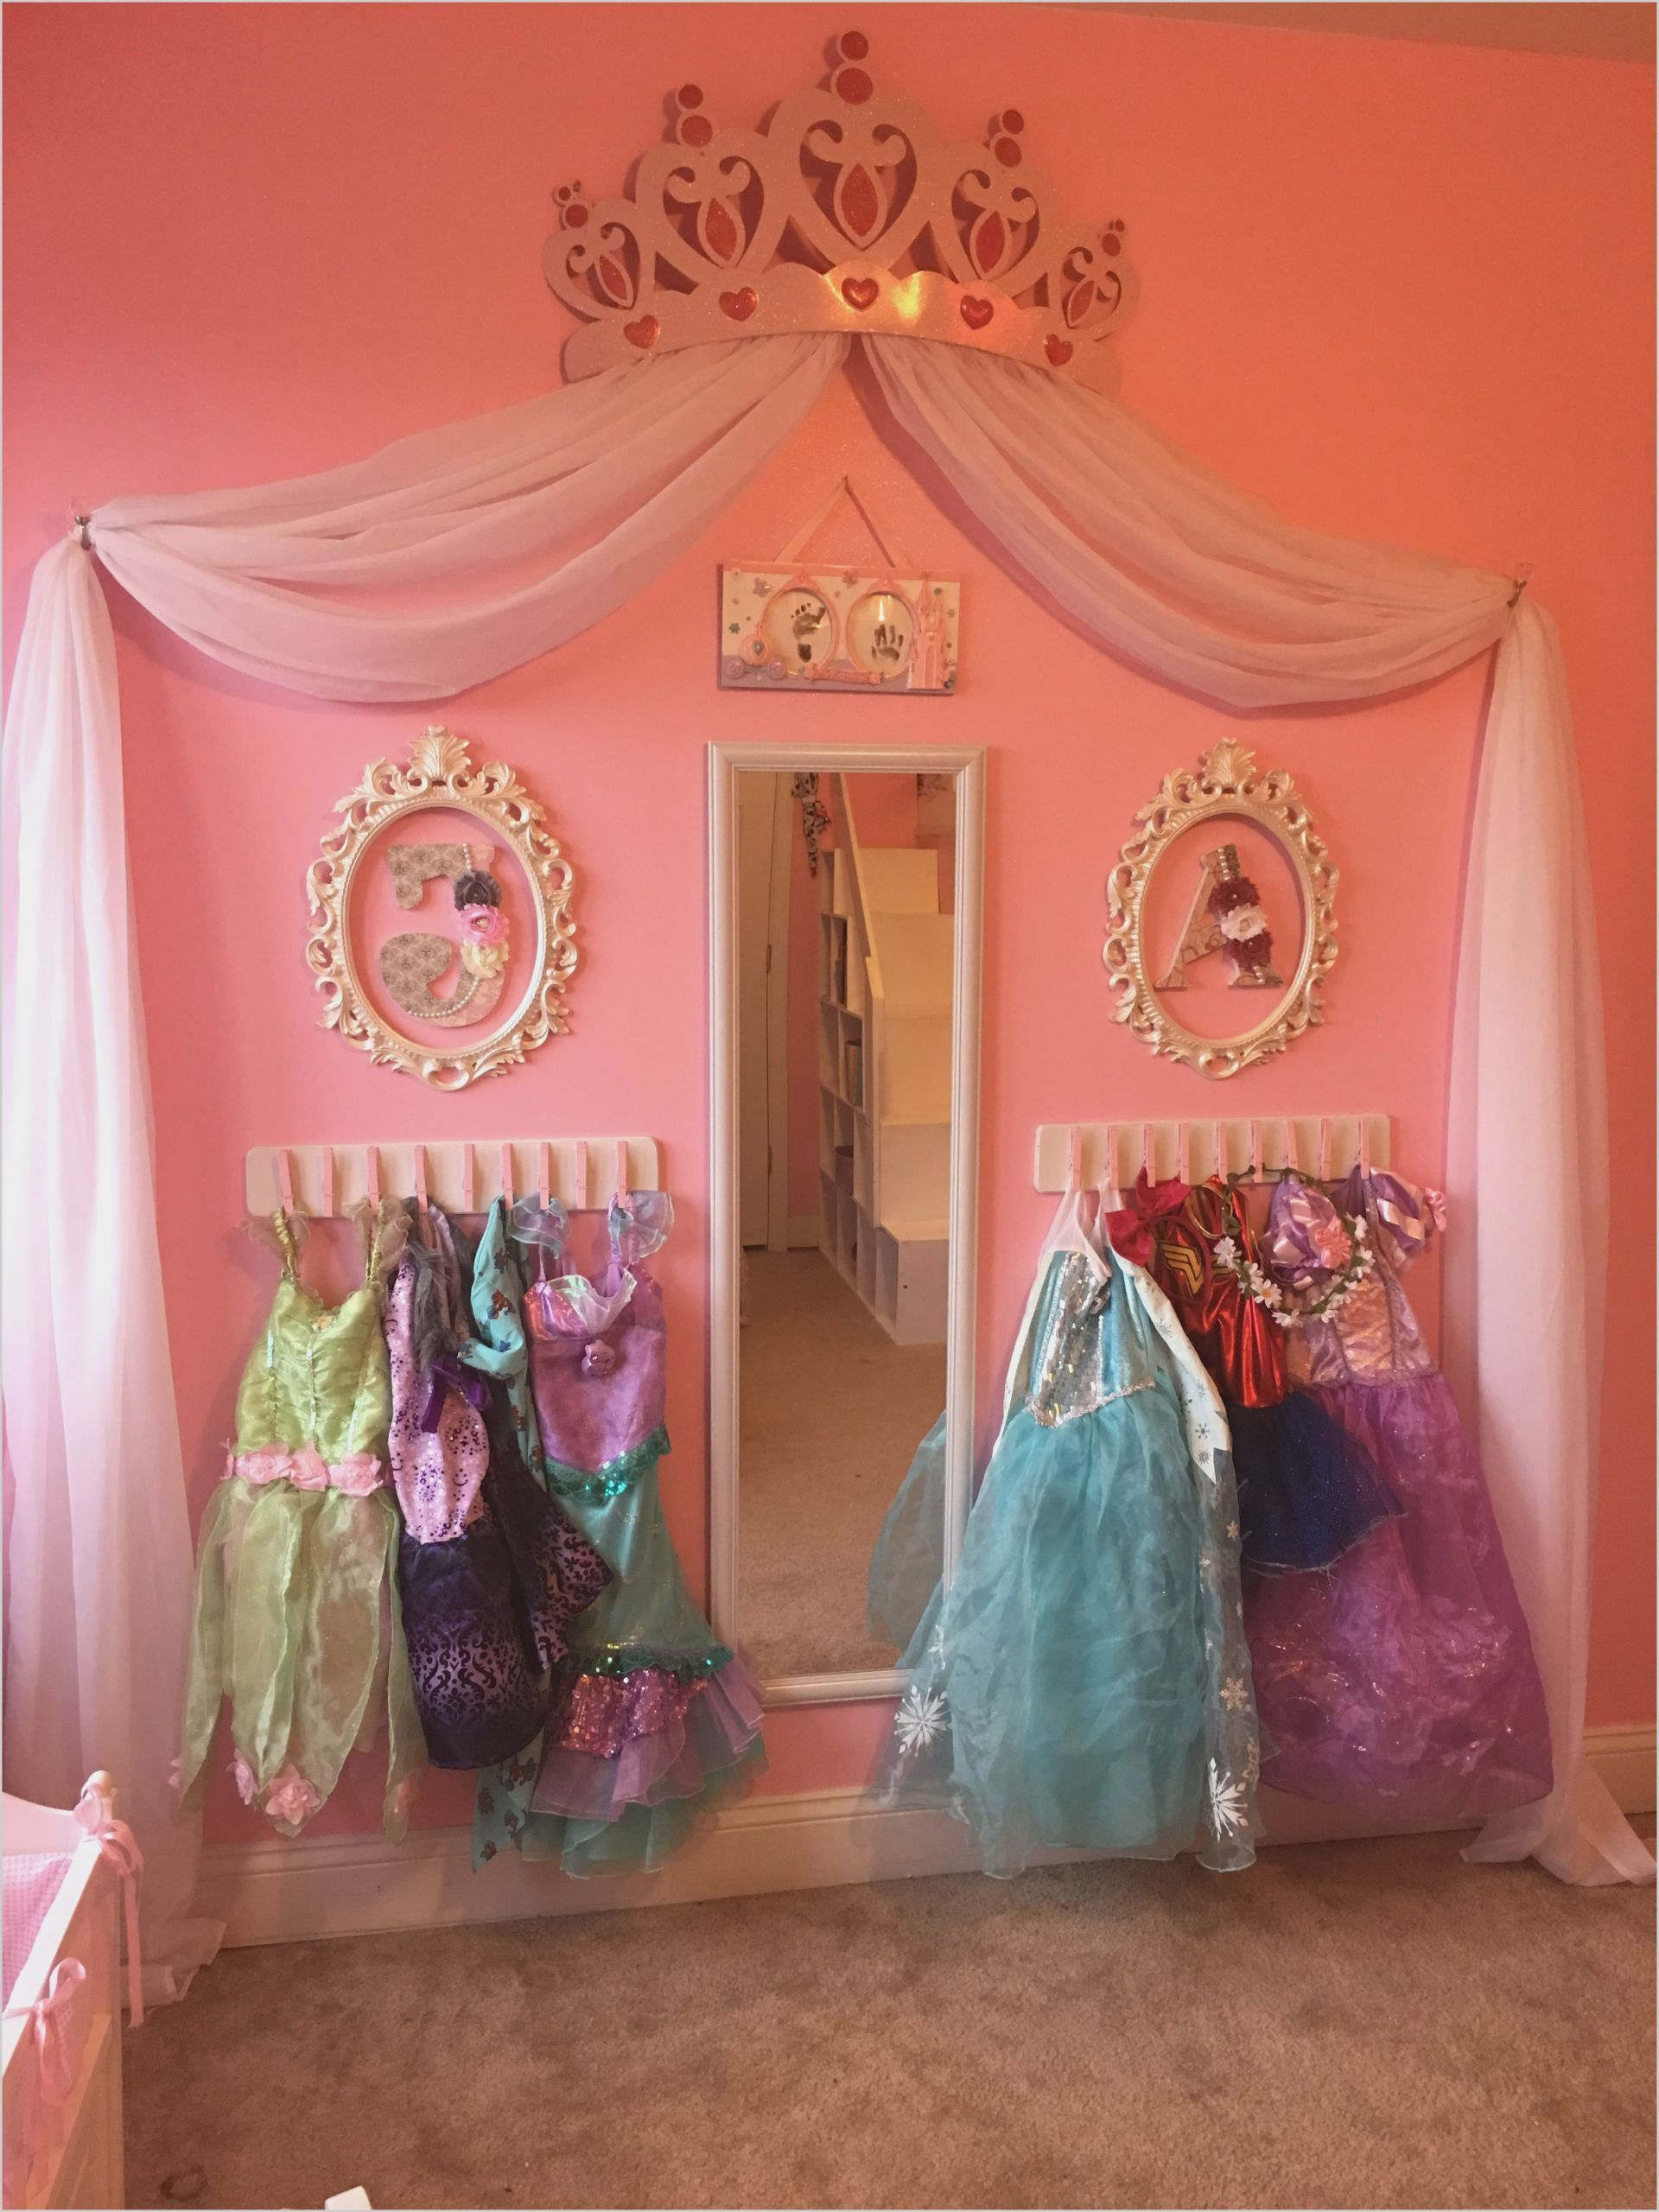 Disney Princess Bedroom Ideas Uk Bedroom Disney Ideas Princess Bedroom Disne Bedroom Disne Disney Princess Bedroom Baby Room Themes Princess Bedrooms